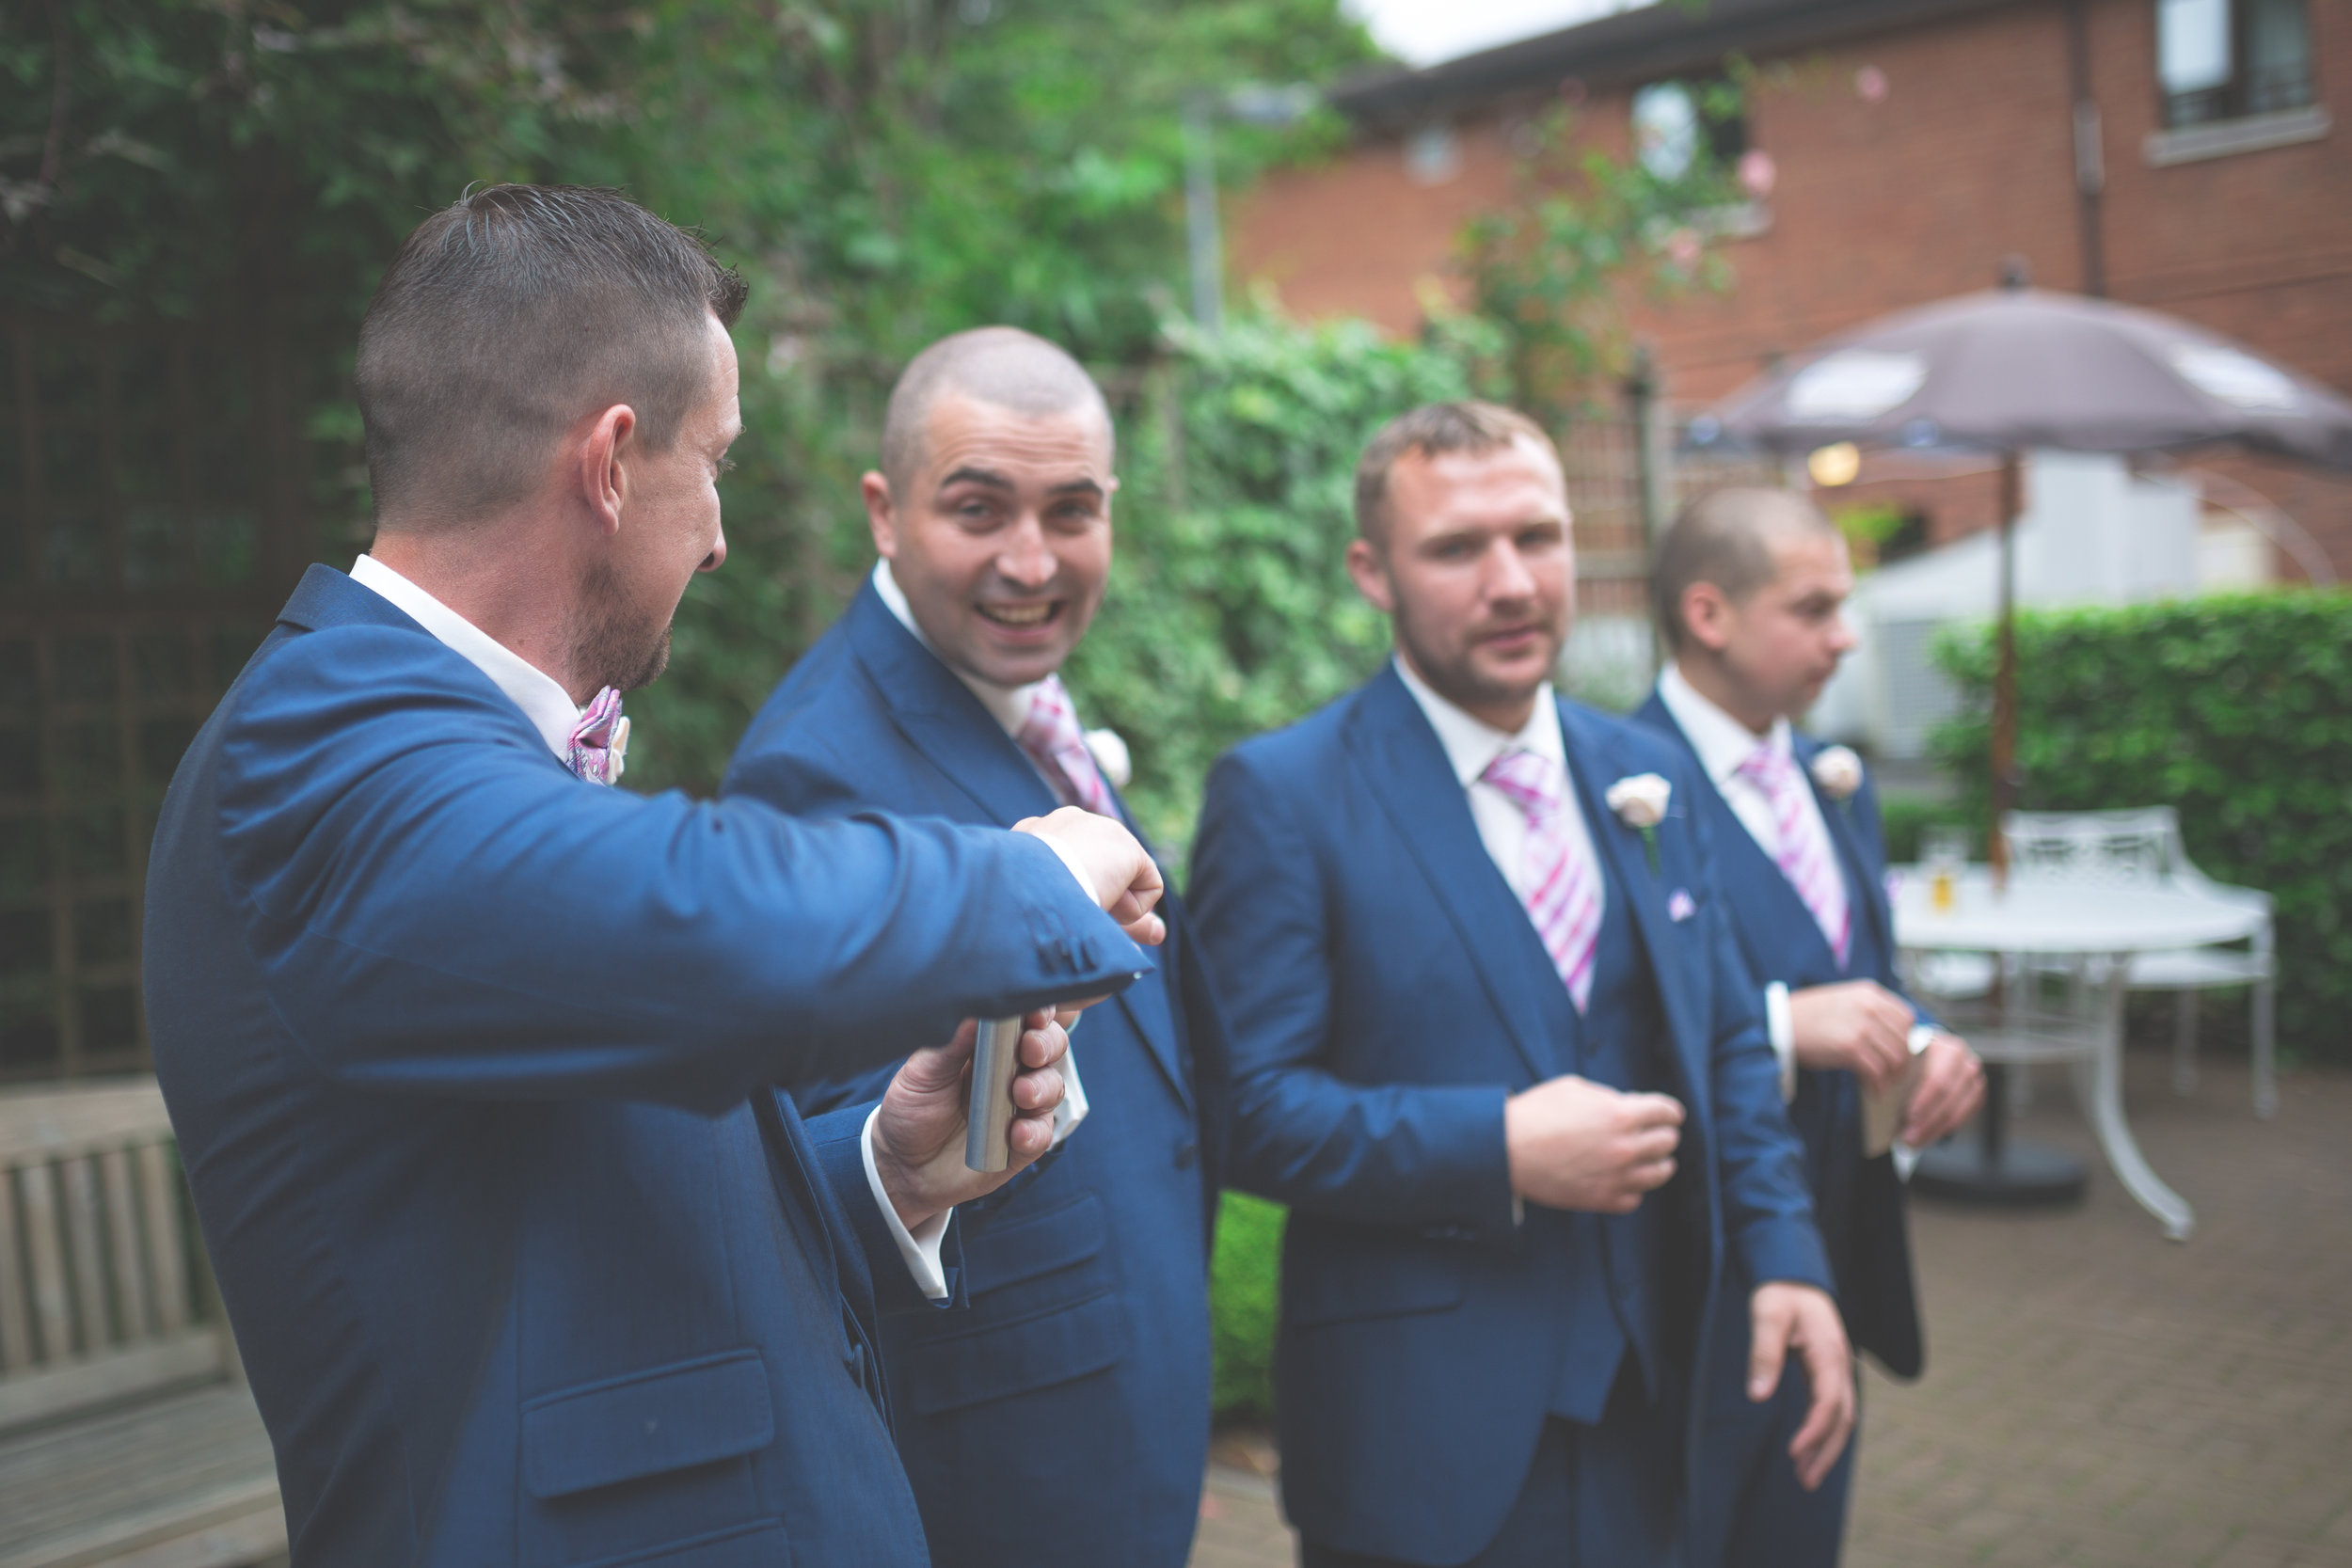 Antoinette & Stephen - Portraits | Brian McEwan Photography | Wedding Photographer Northern Ireland 73.jpg